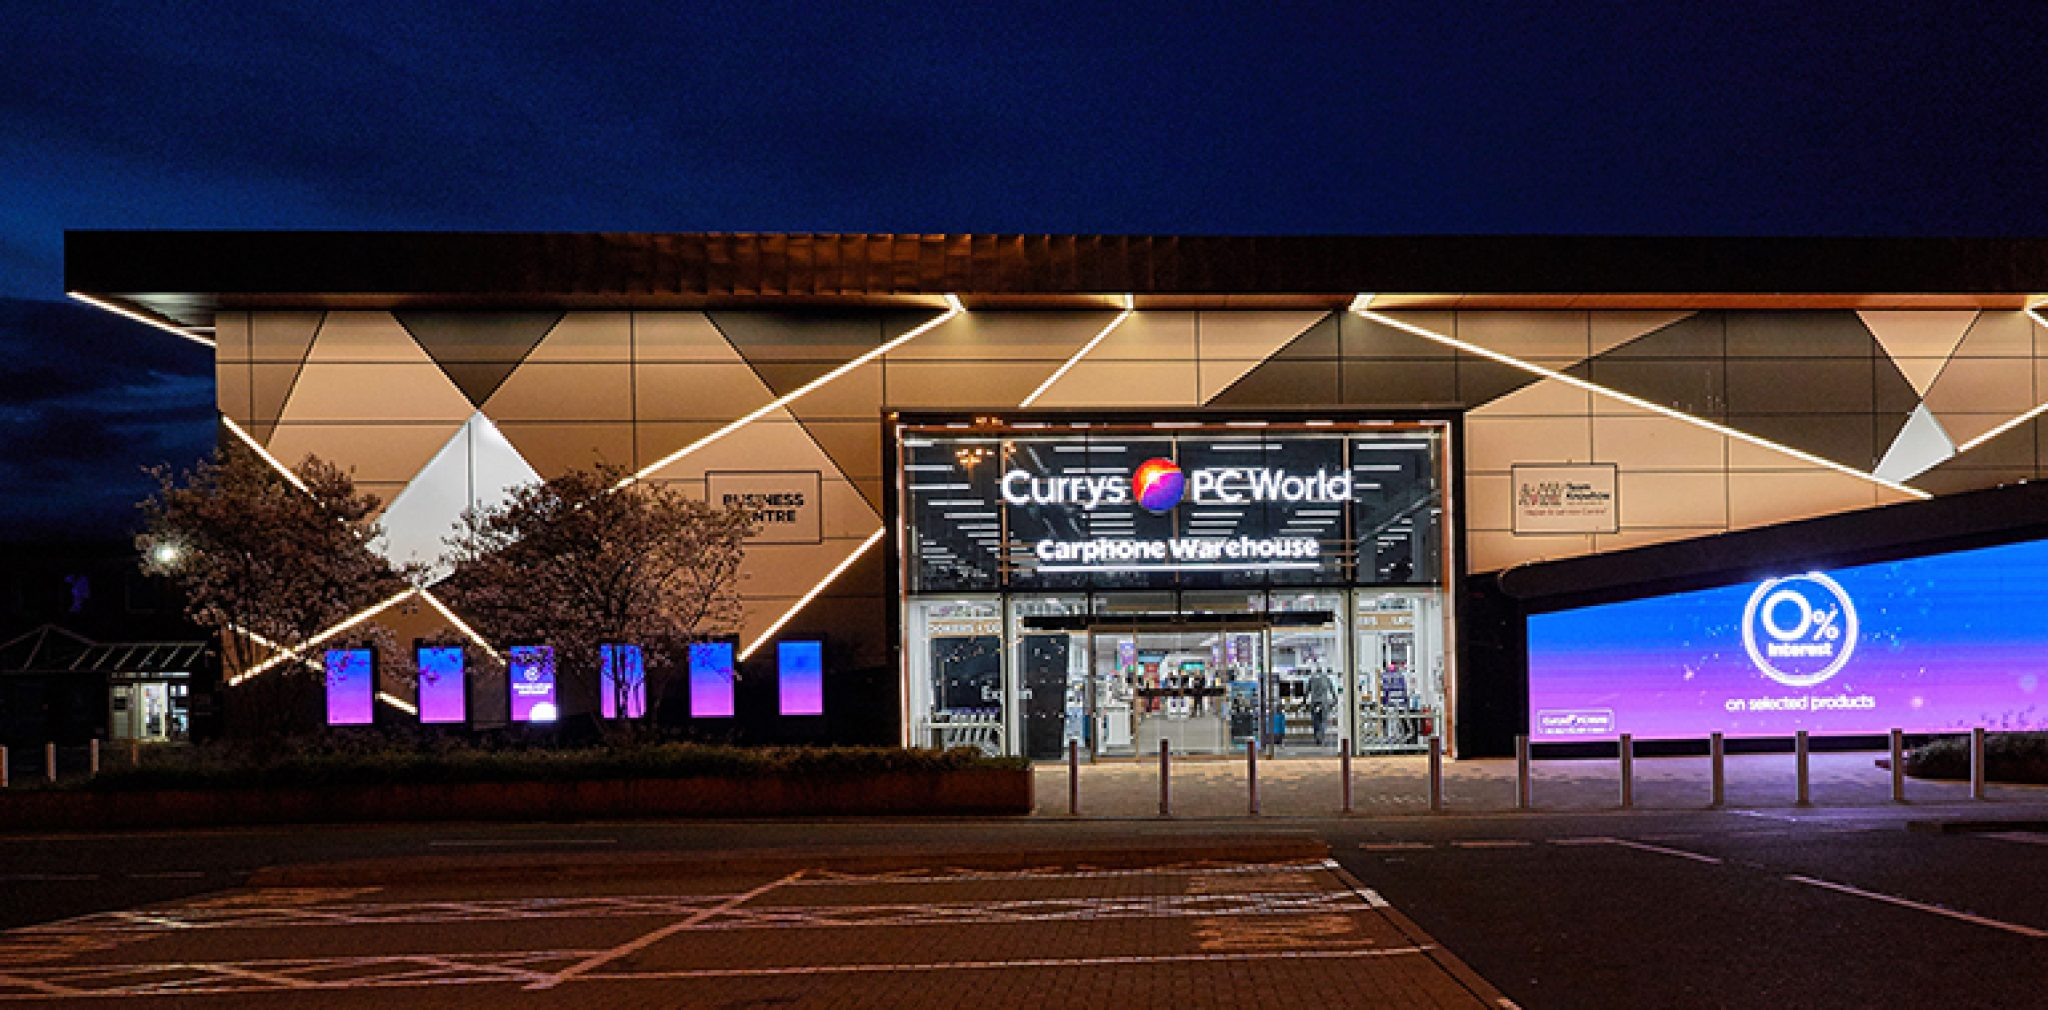 Dixons Carphone runs Currys, PC World and Carphone Warehouse